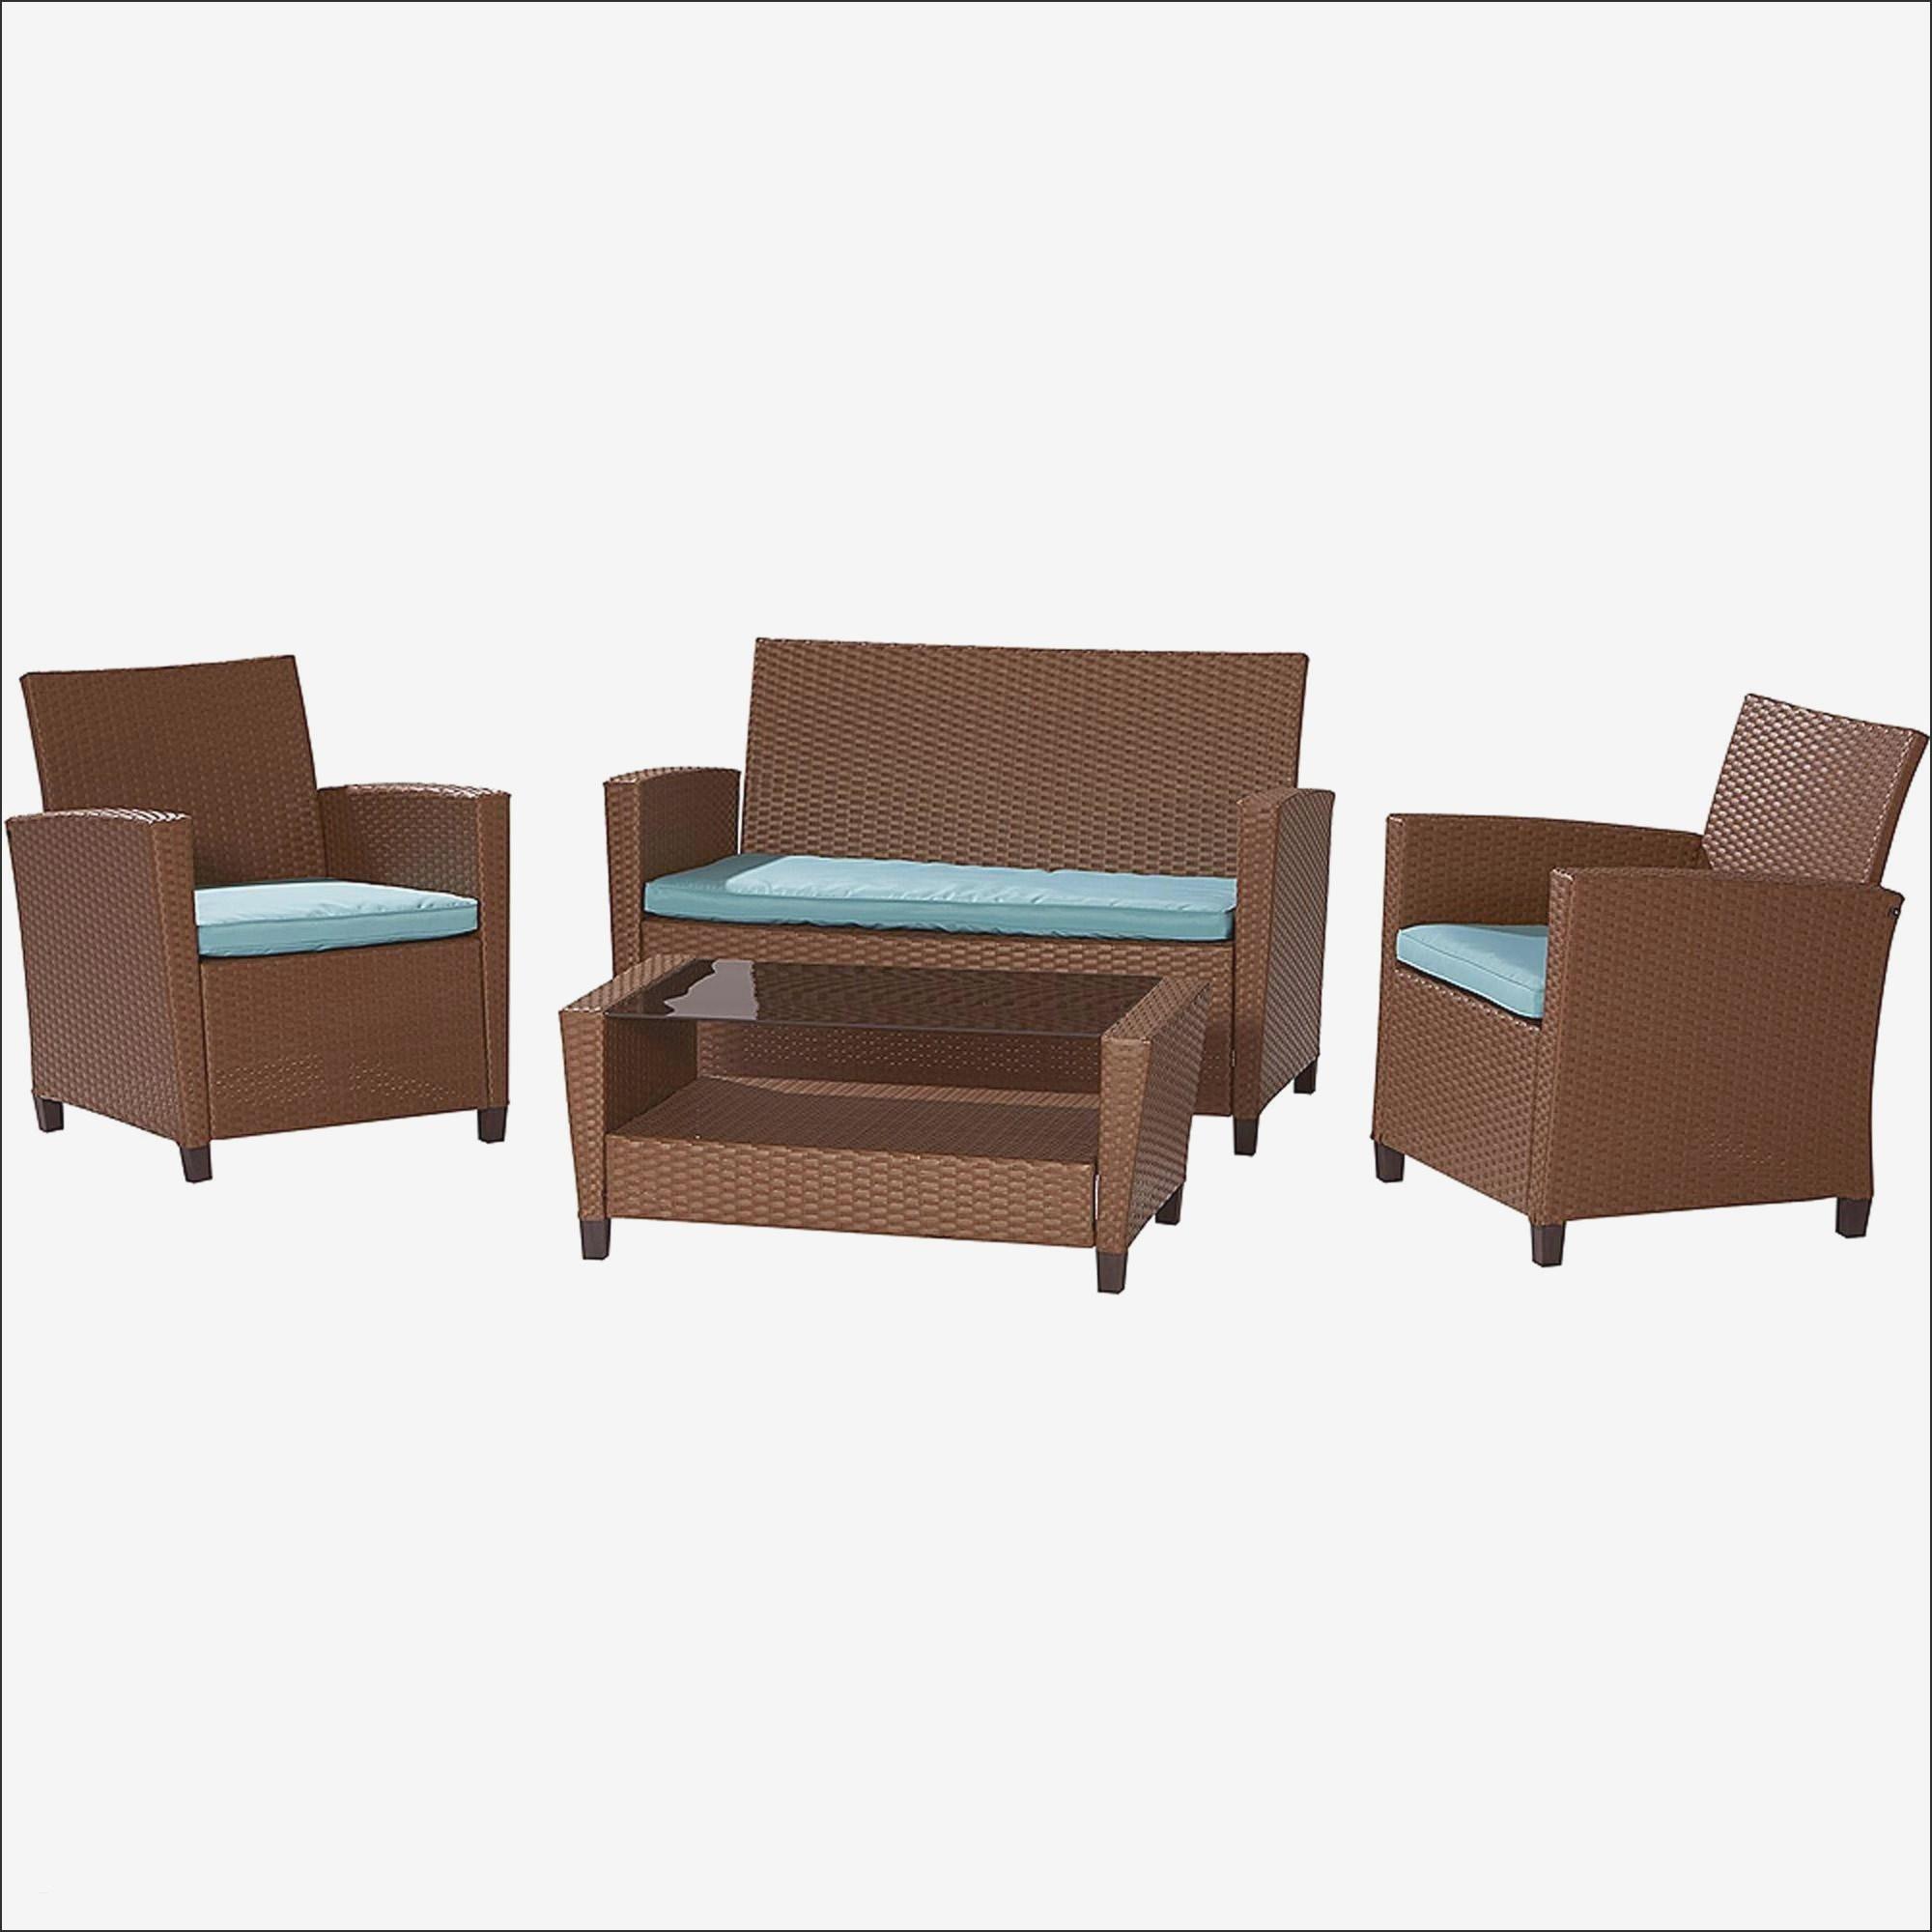 Cheap Vases Walmart Of Walmart Leather sofa Room Ideas Regarding Walmart Floor Plan Inspirational Wicker Outdoor sofa 0d Patio Chairs Ideas Reluv Leather Renew